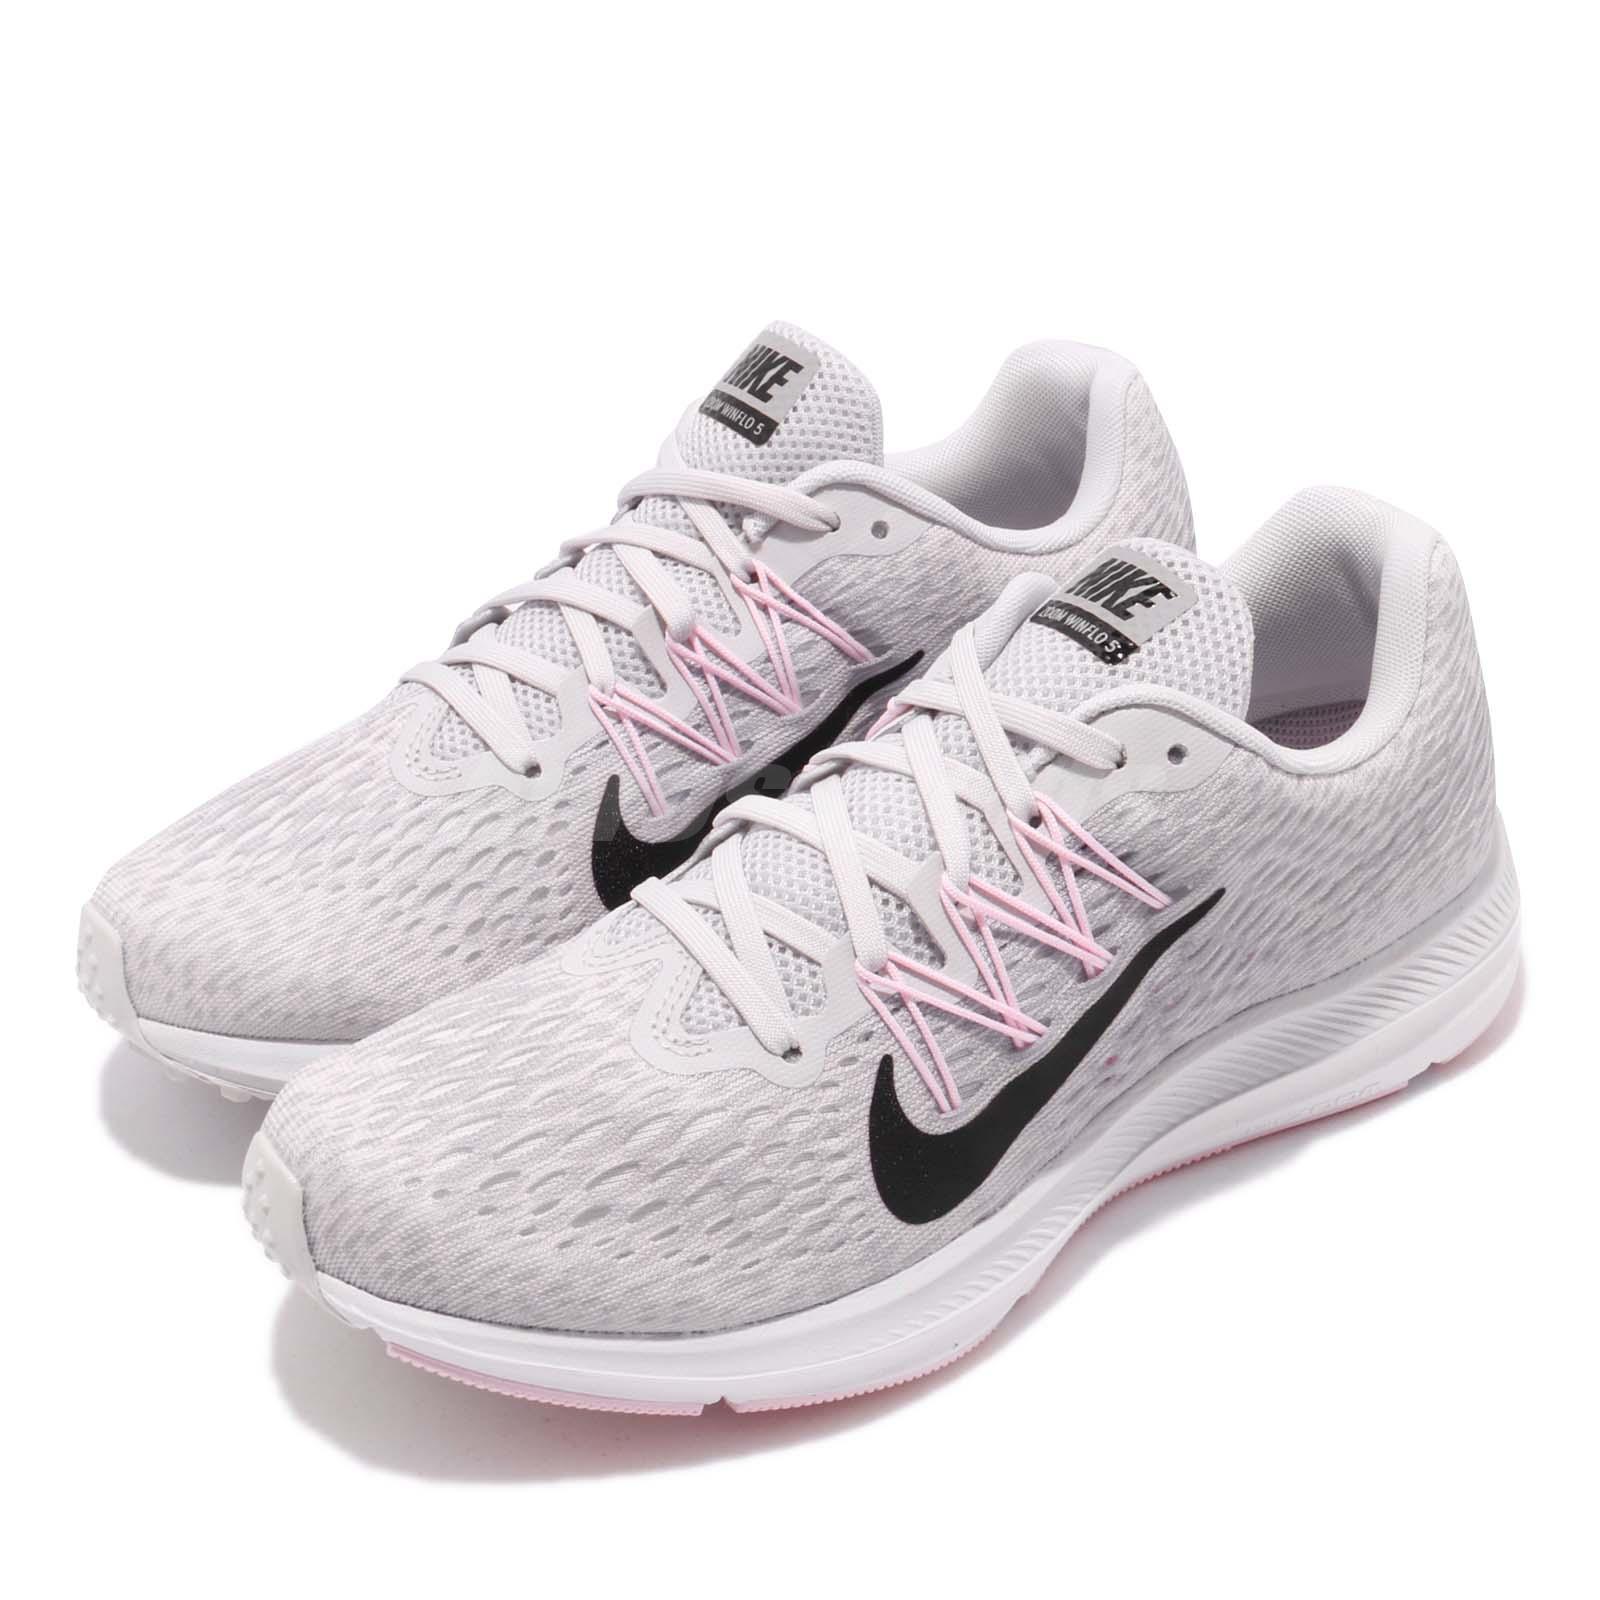 Destrucción Polar Comunista  Nike Wmns Zoom Winflo 5 Grey Black Pink Womens Running Shoes AA7414-013 |  eBay